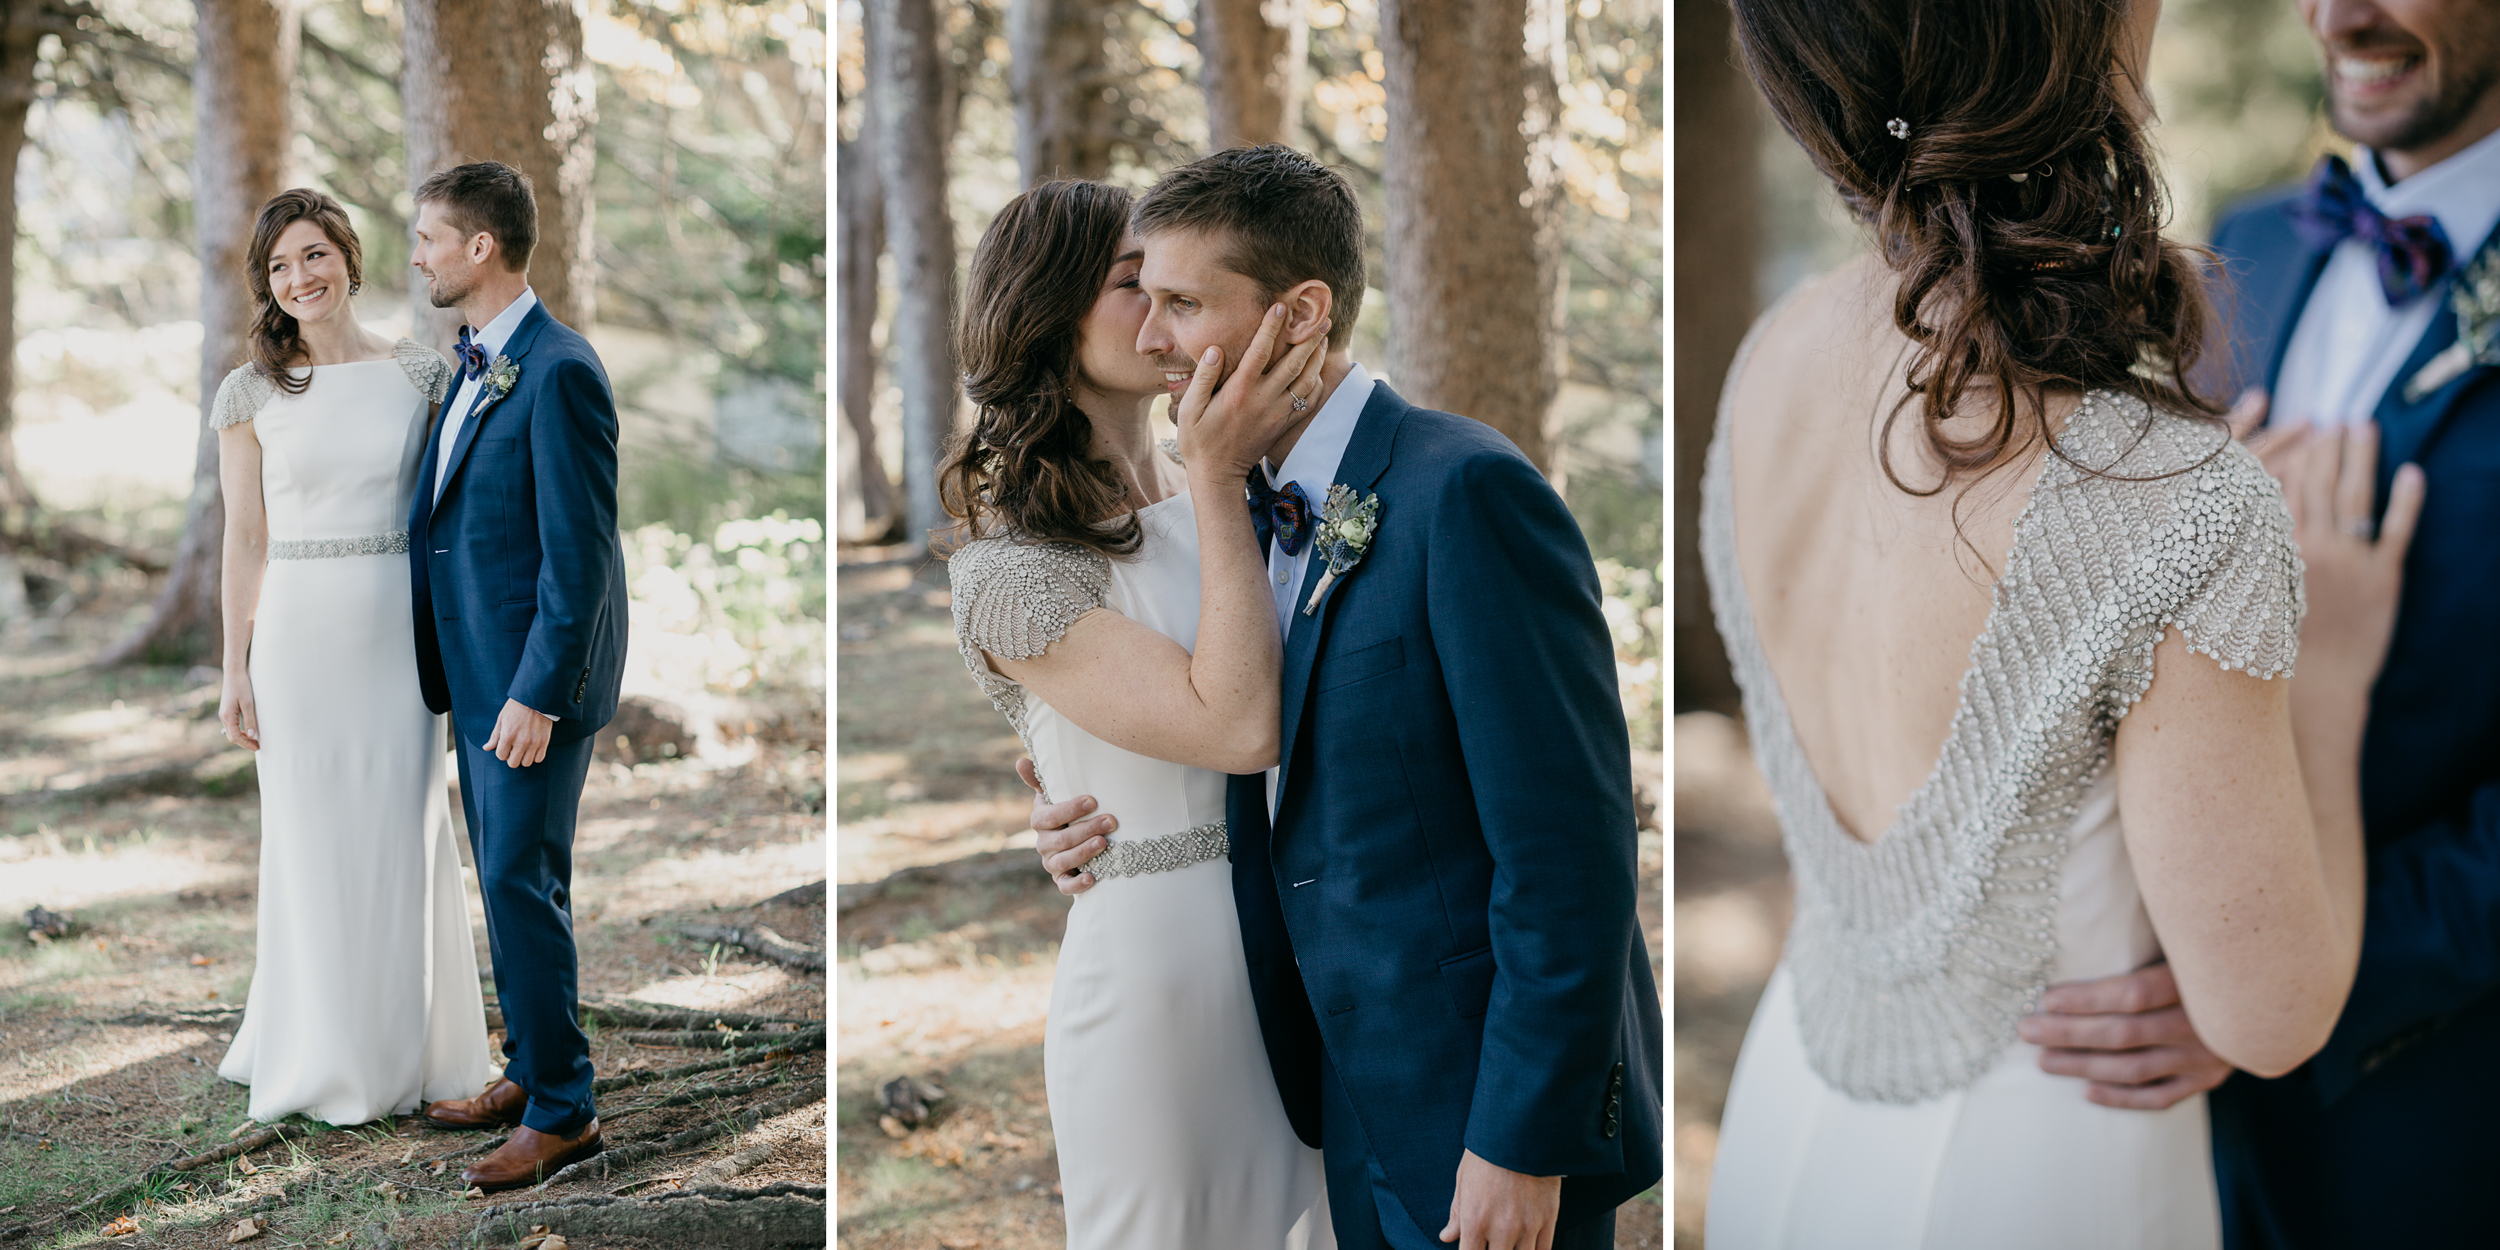 Mackenzie_Collins_Maine_wedding_in_Rockport_Union_hall_Nina_June_008.jpg